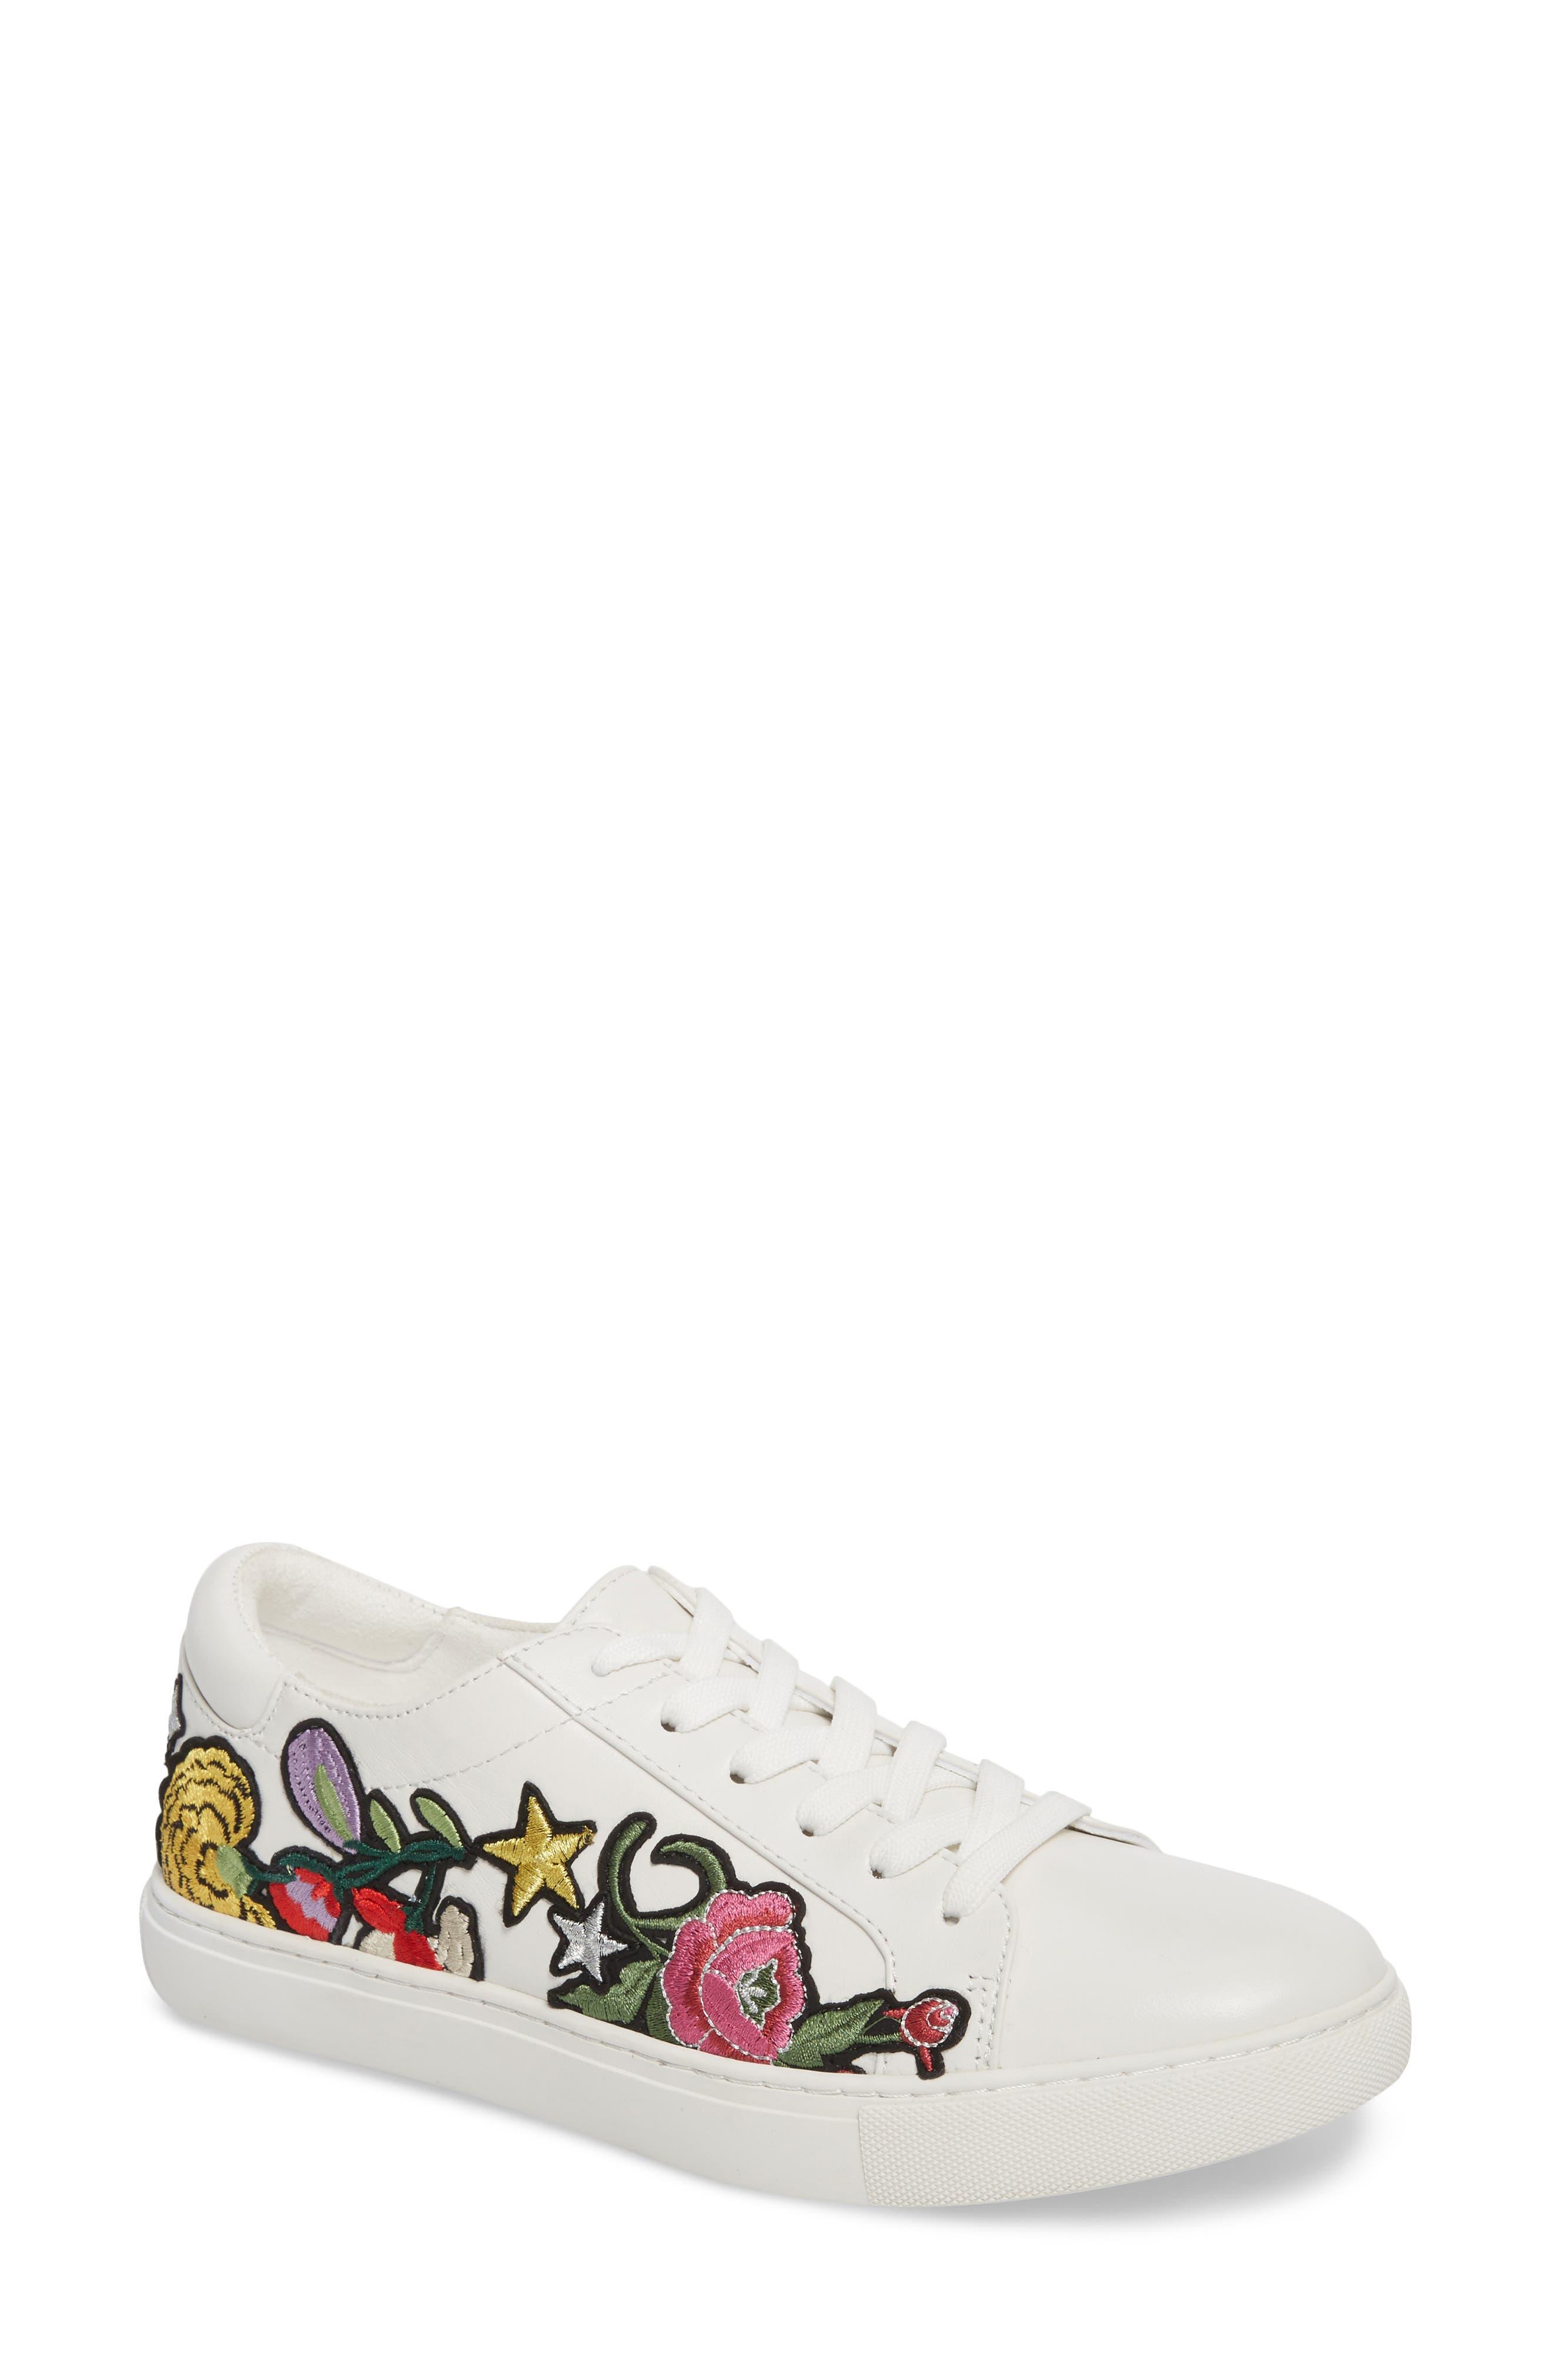 Kenneth Cole New York \u0027Kam\u0027 Sneaker ...